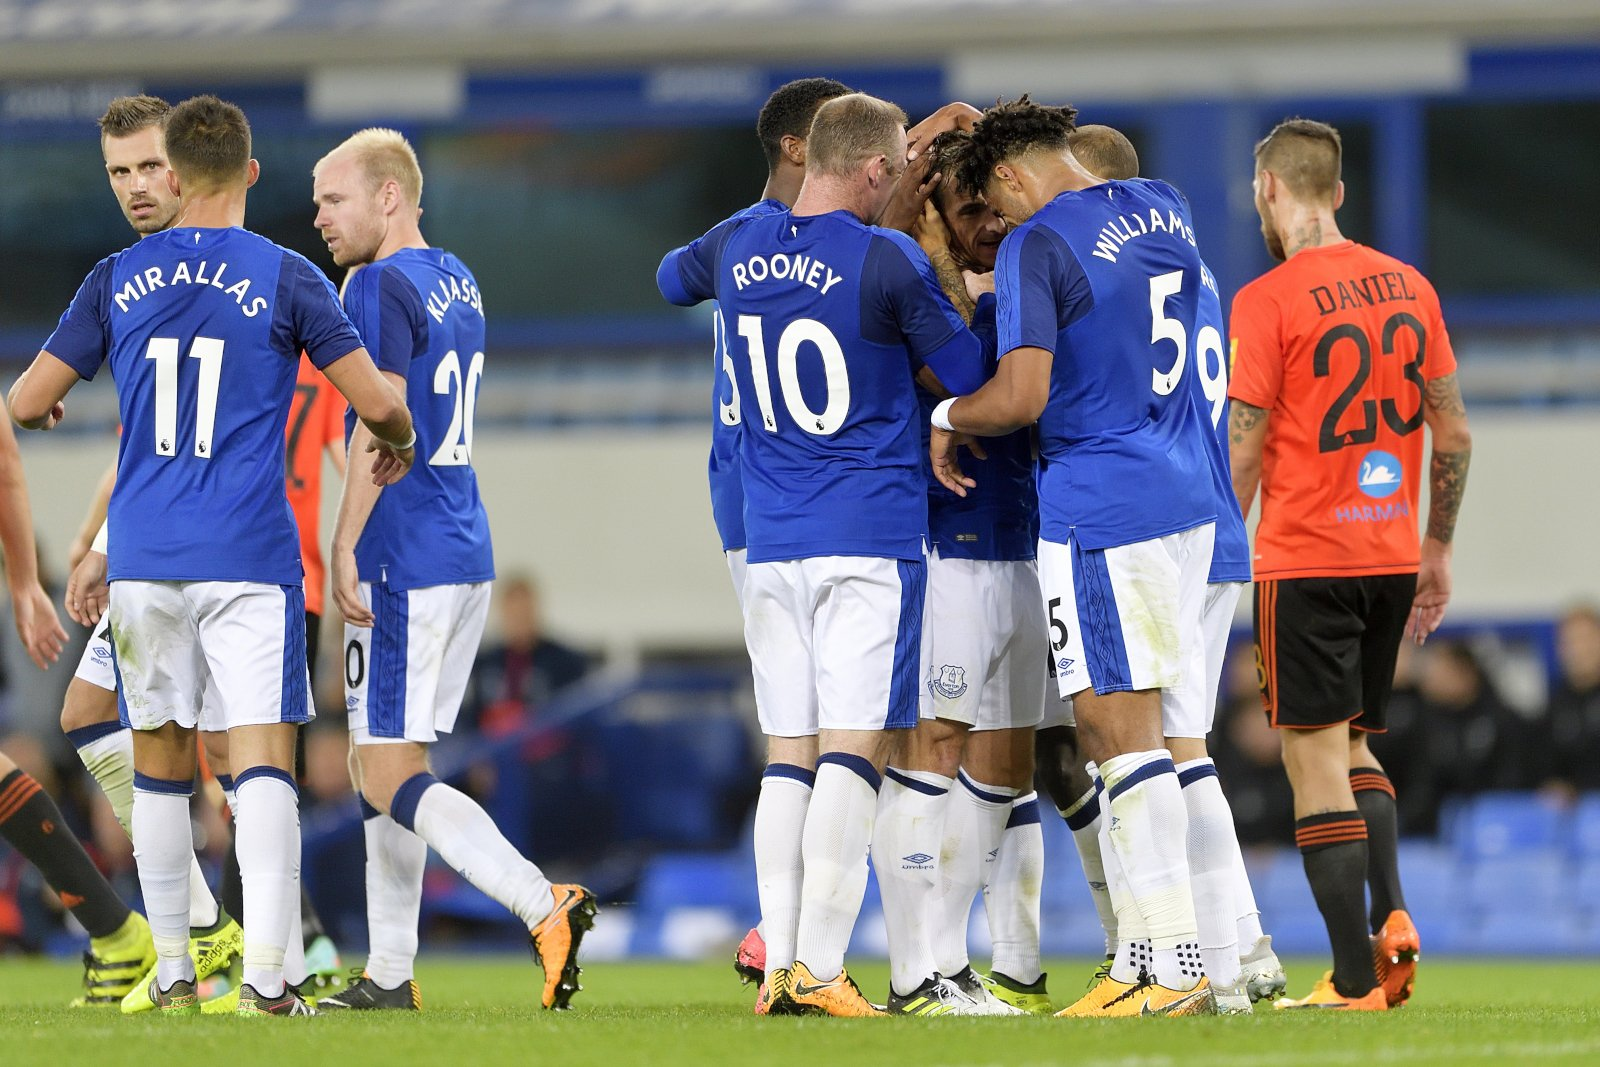 Europa: Hassan Opens Account, Rooney Struggles, Simon's Gent Held